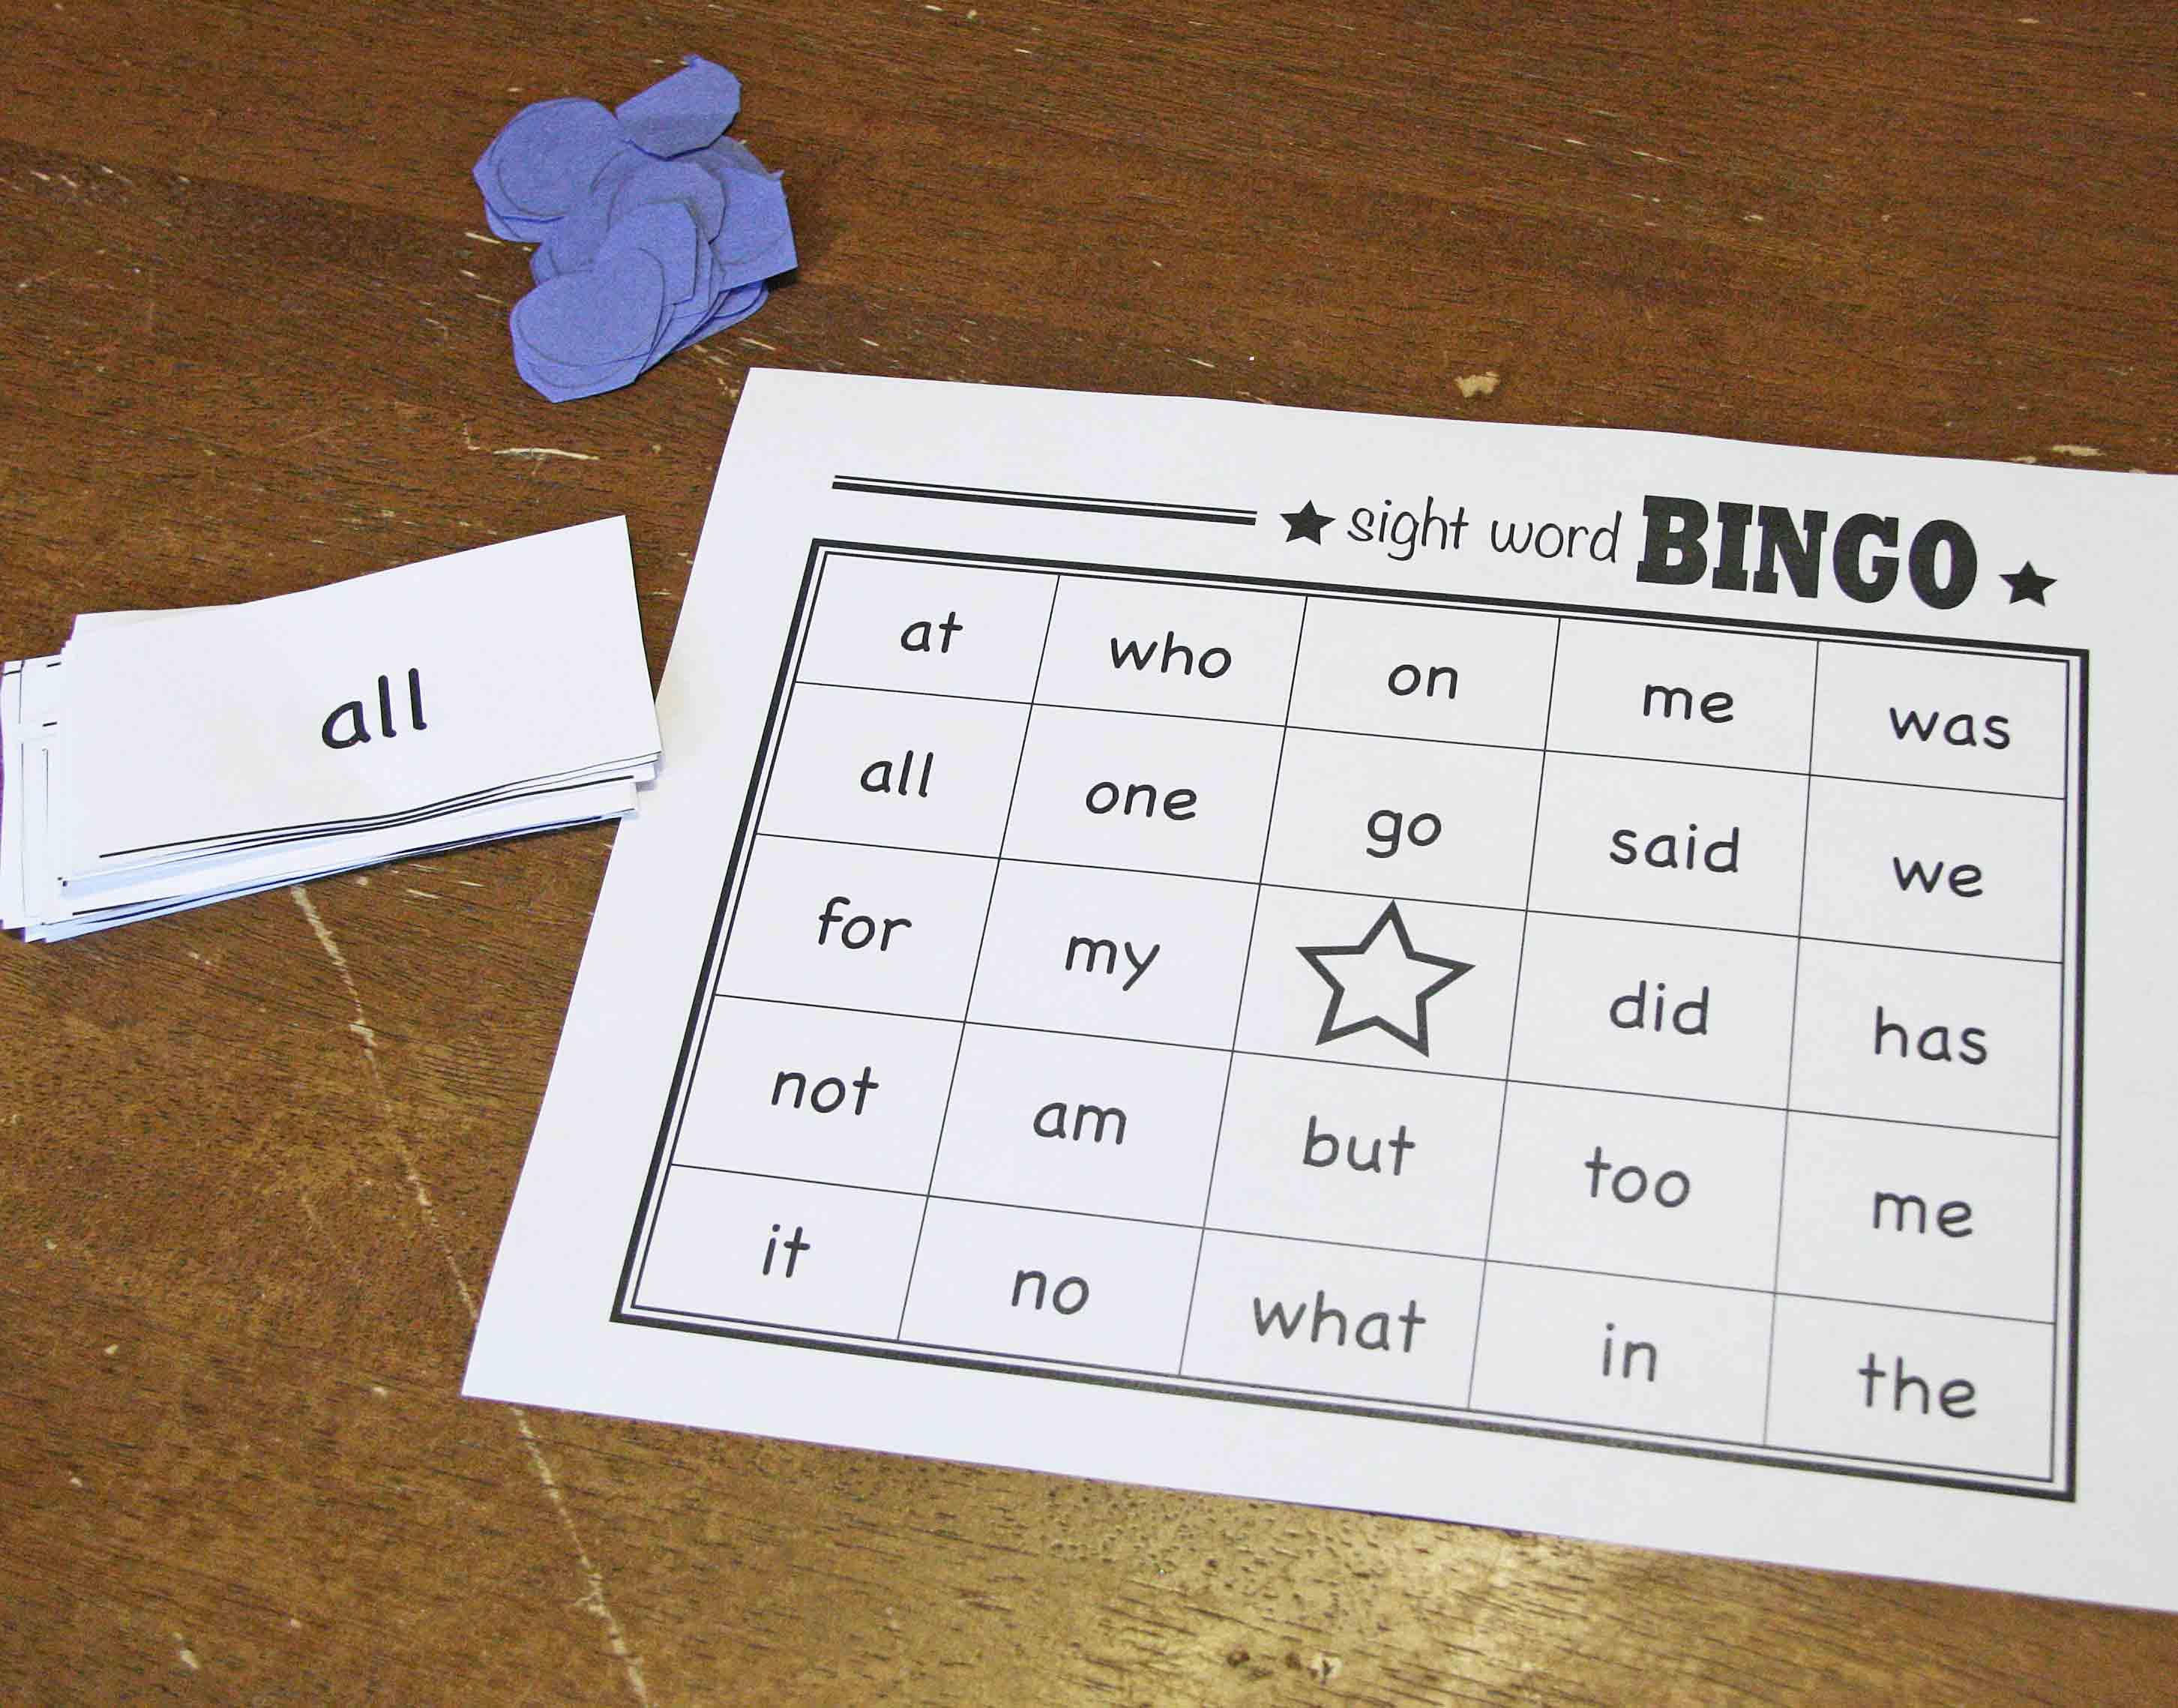 Sight Word Bingo Game The B Keeps Us Honest